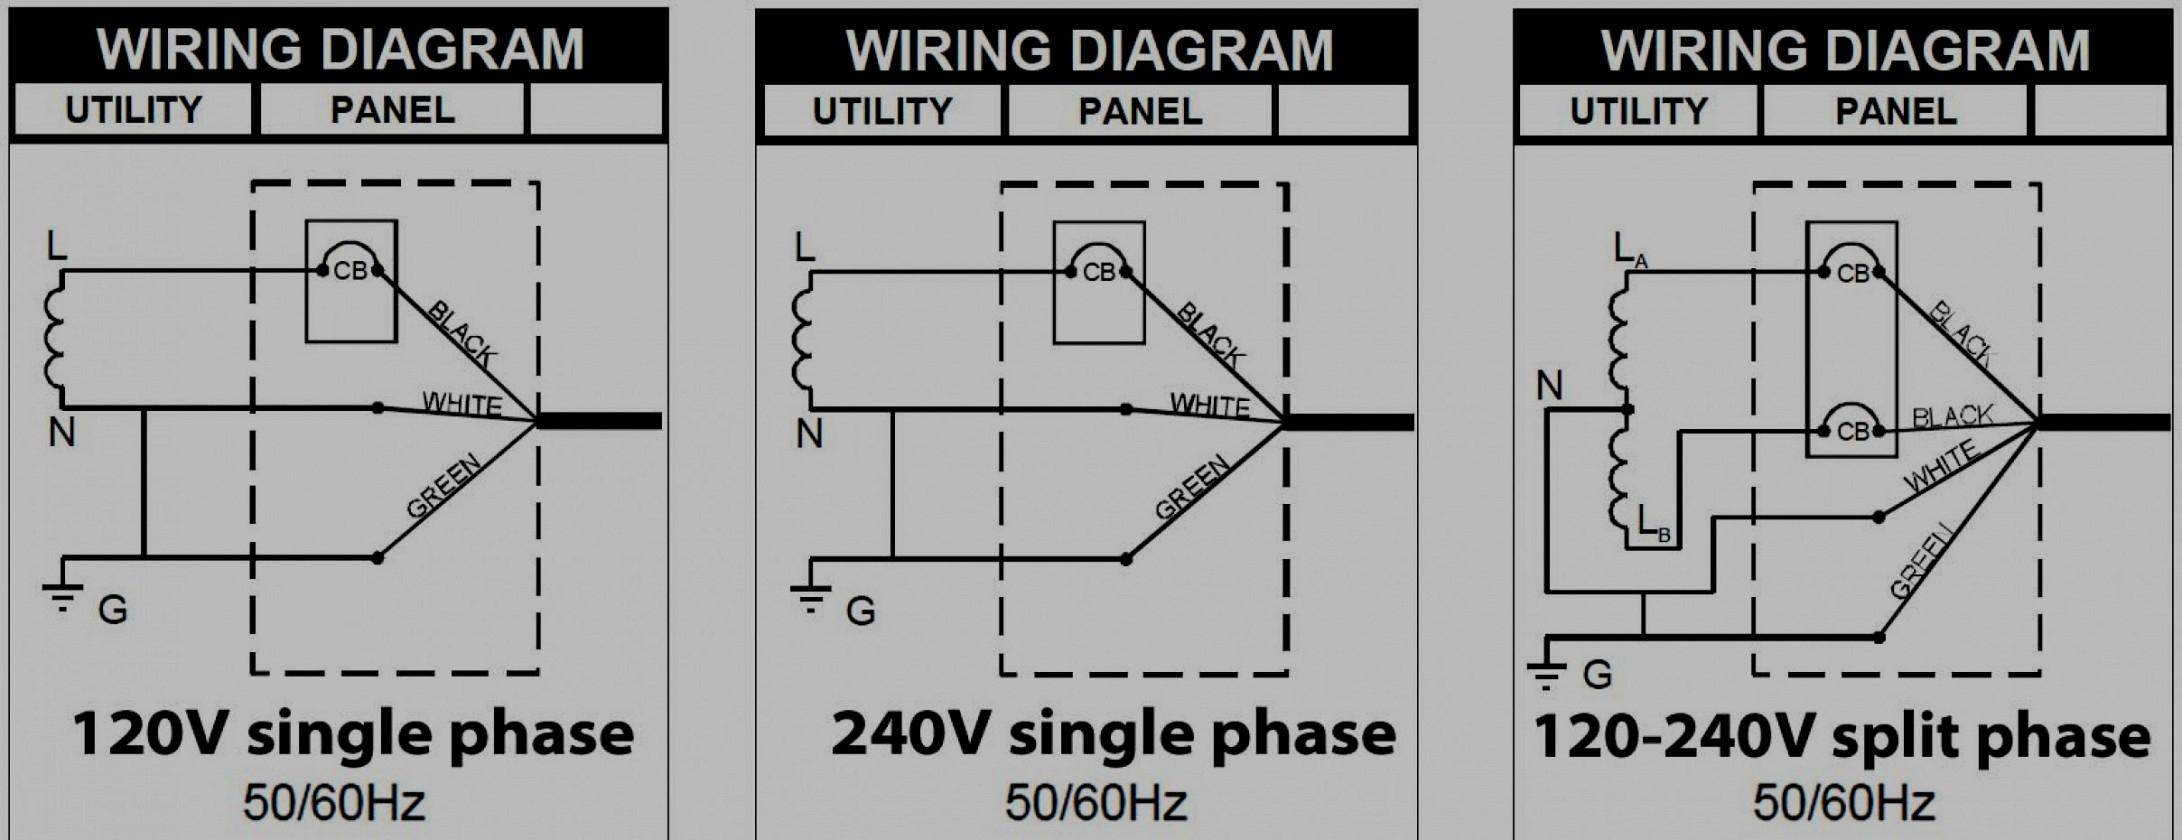 208 Volt Lighting Wiring Diagram | Wiring Diagram - 208 Volt Single Phase Wiring Diagram